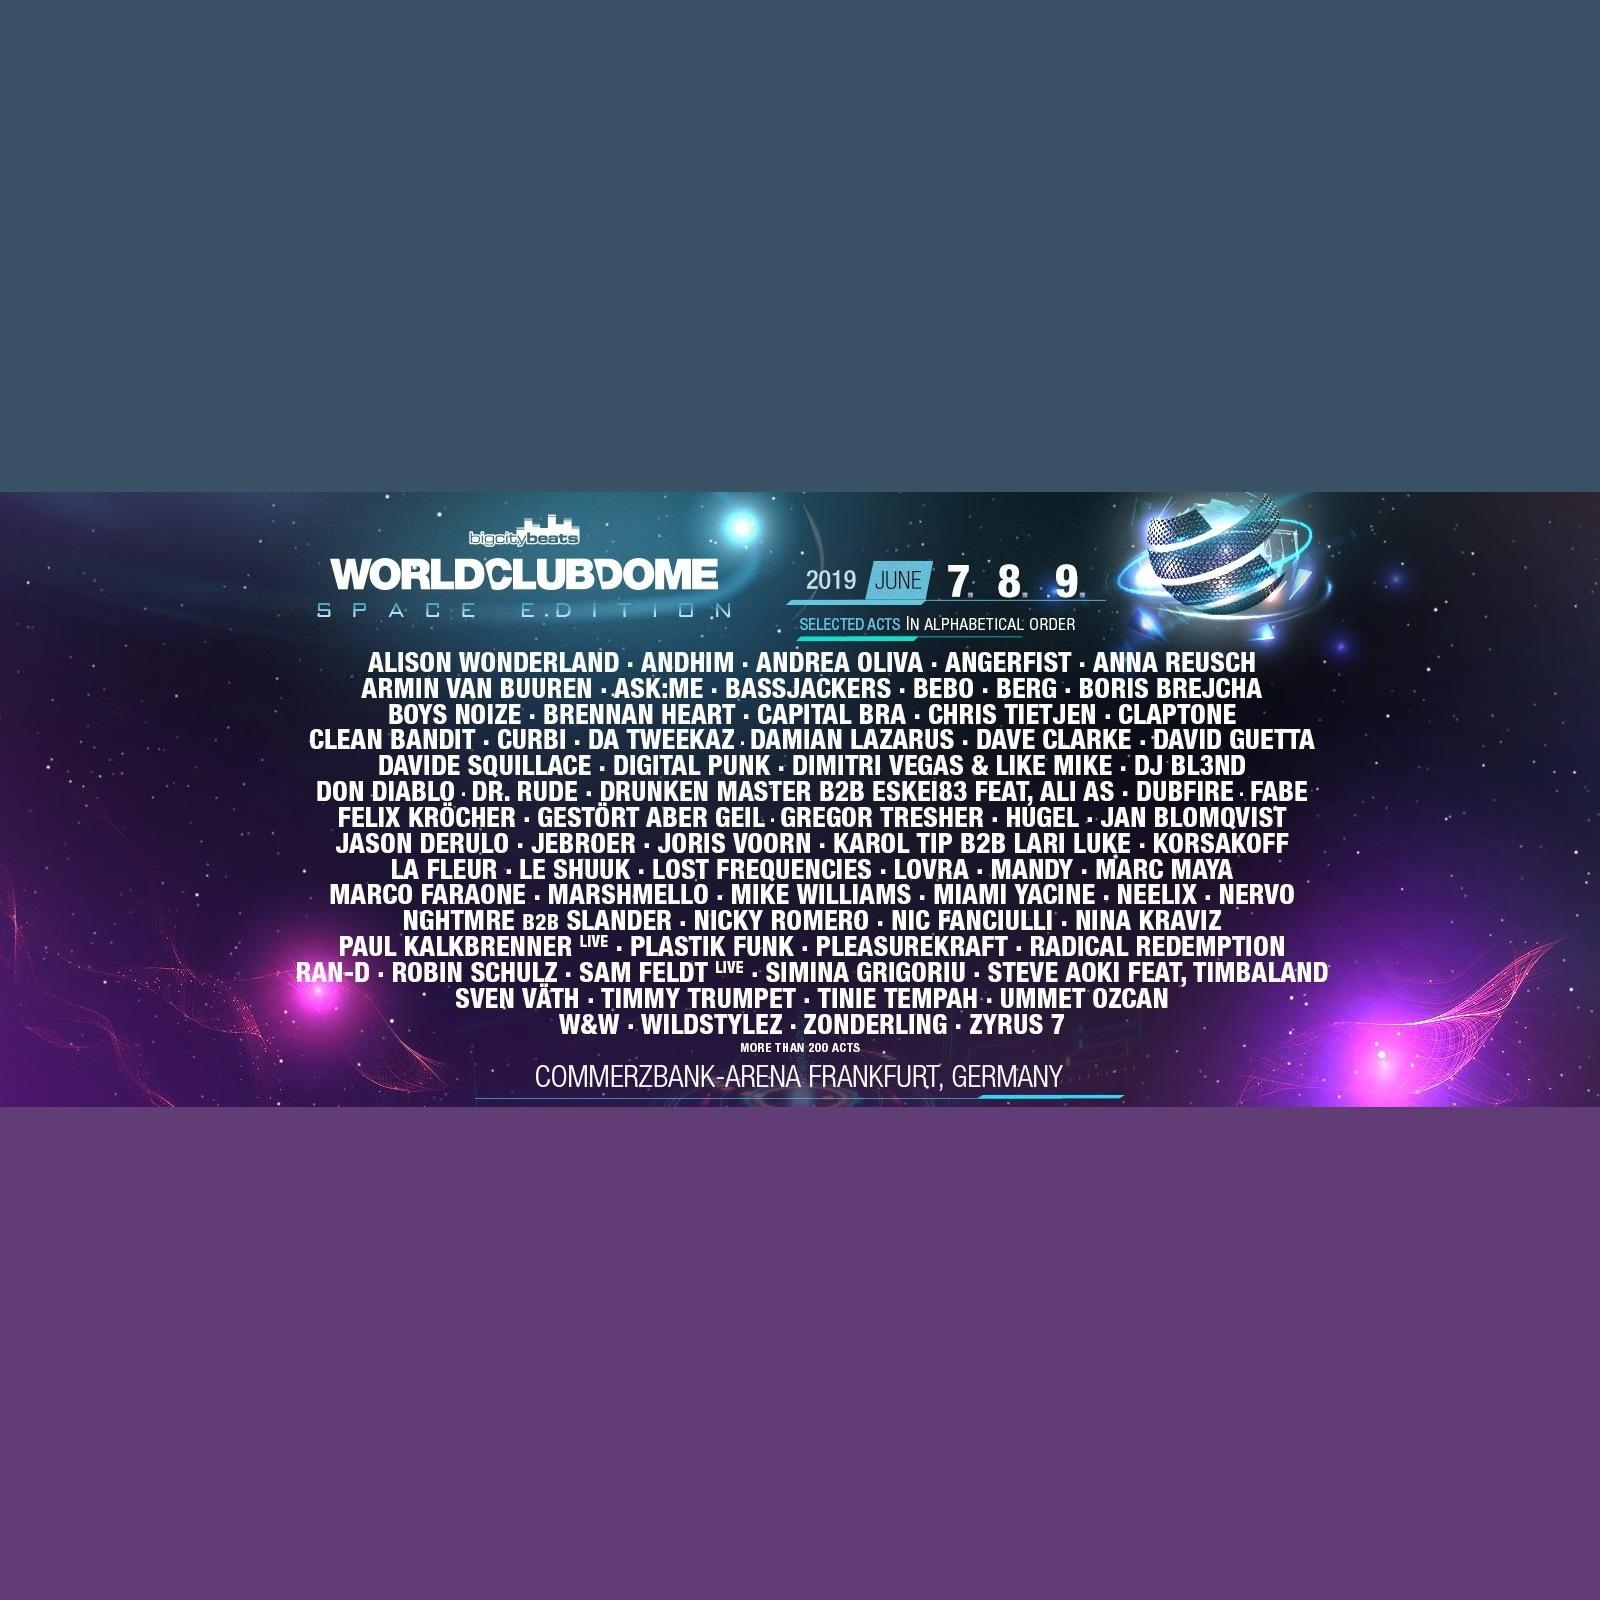 World Club Dome 8 June 2019 Commerzbank Arena Frankfurt Am Main